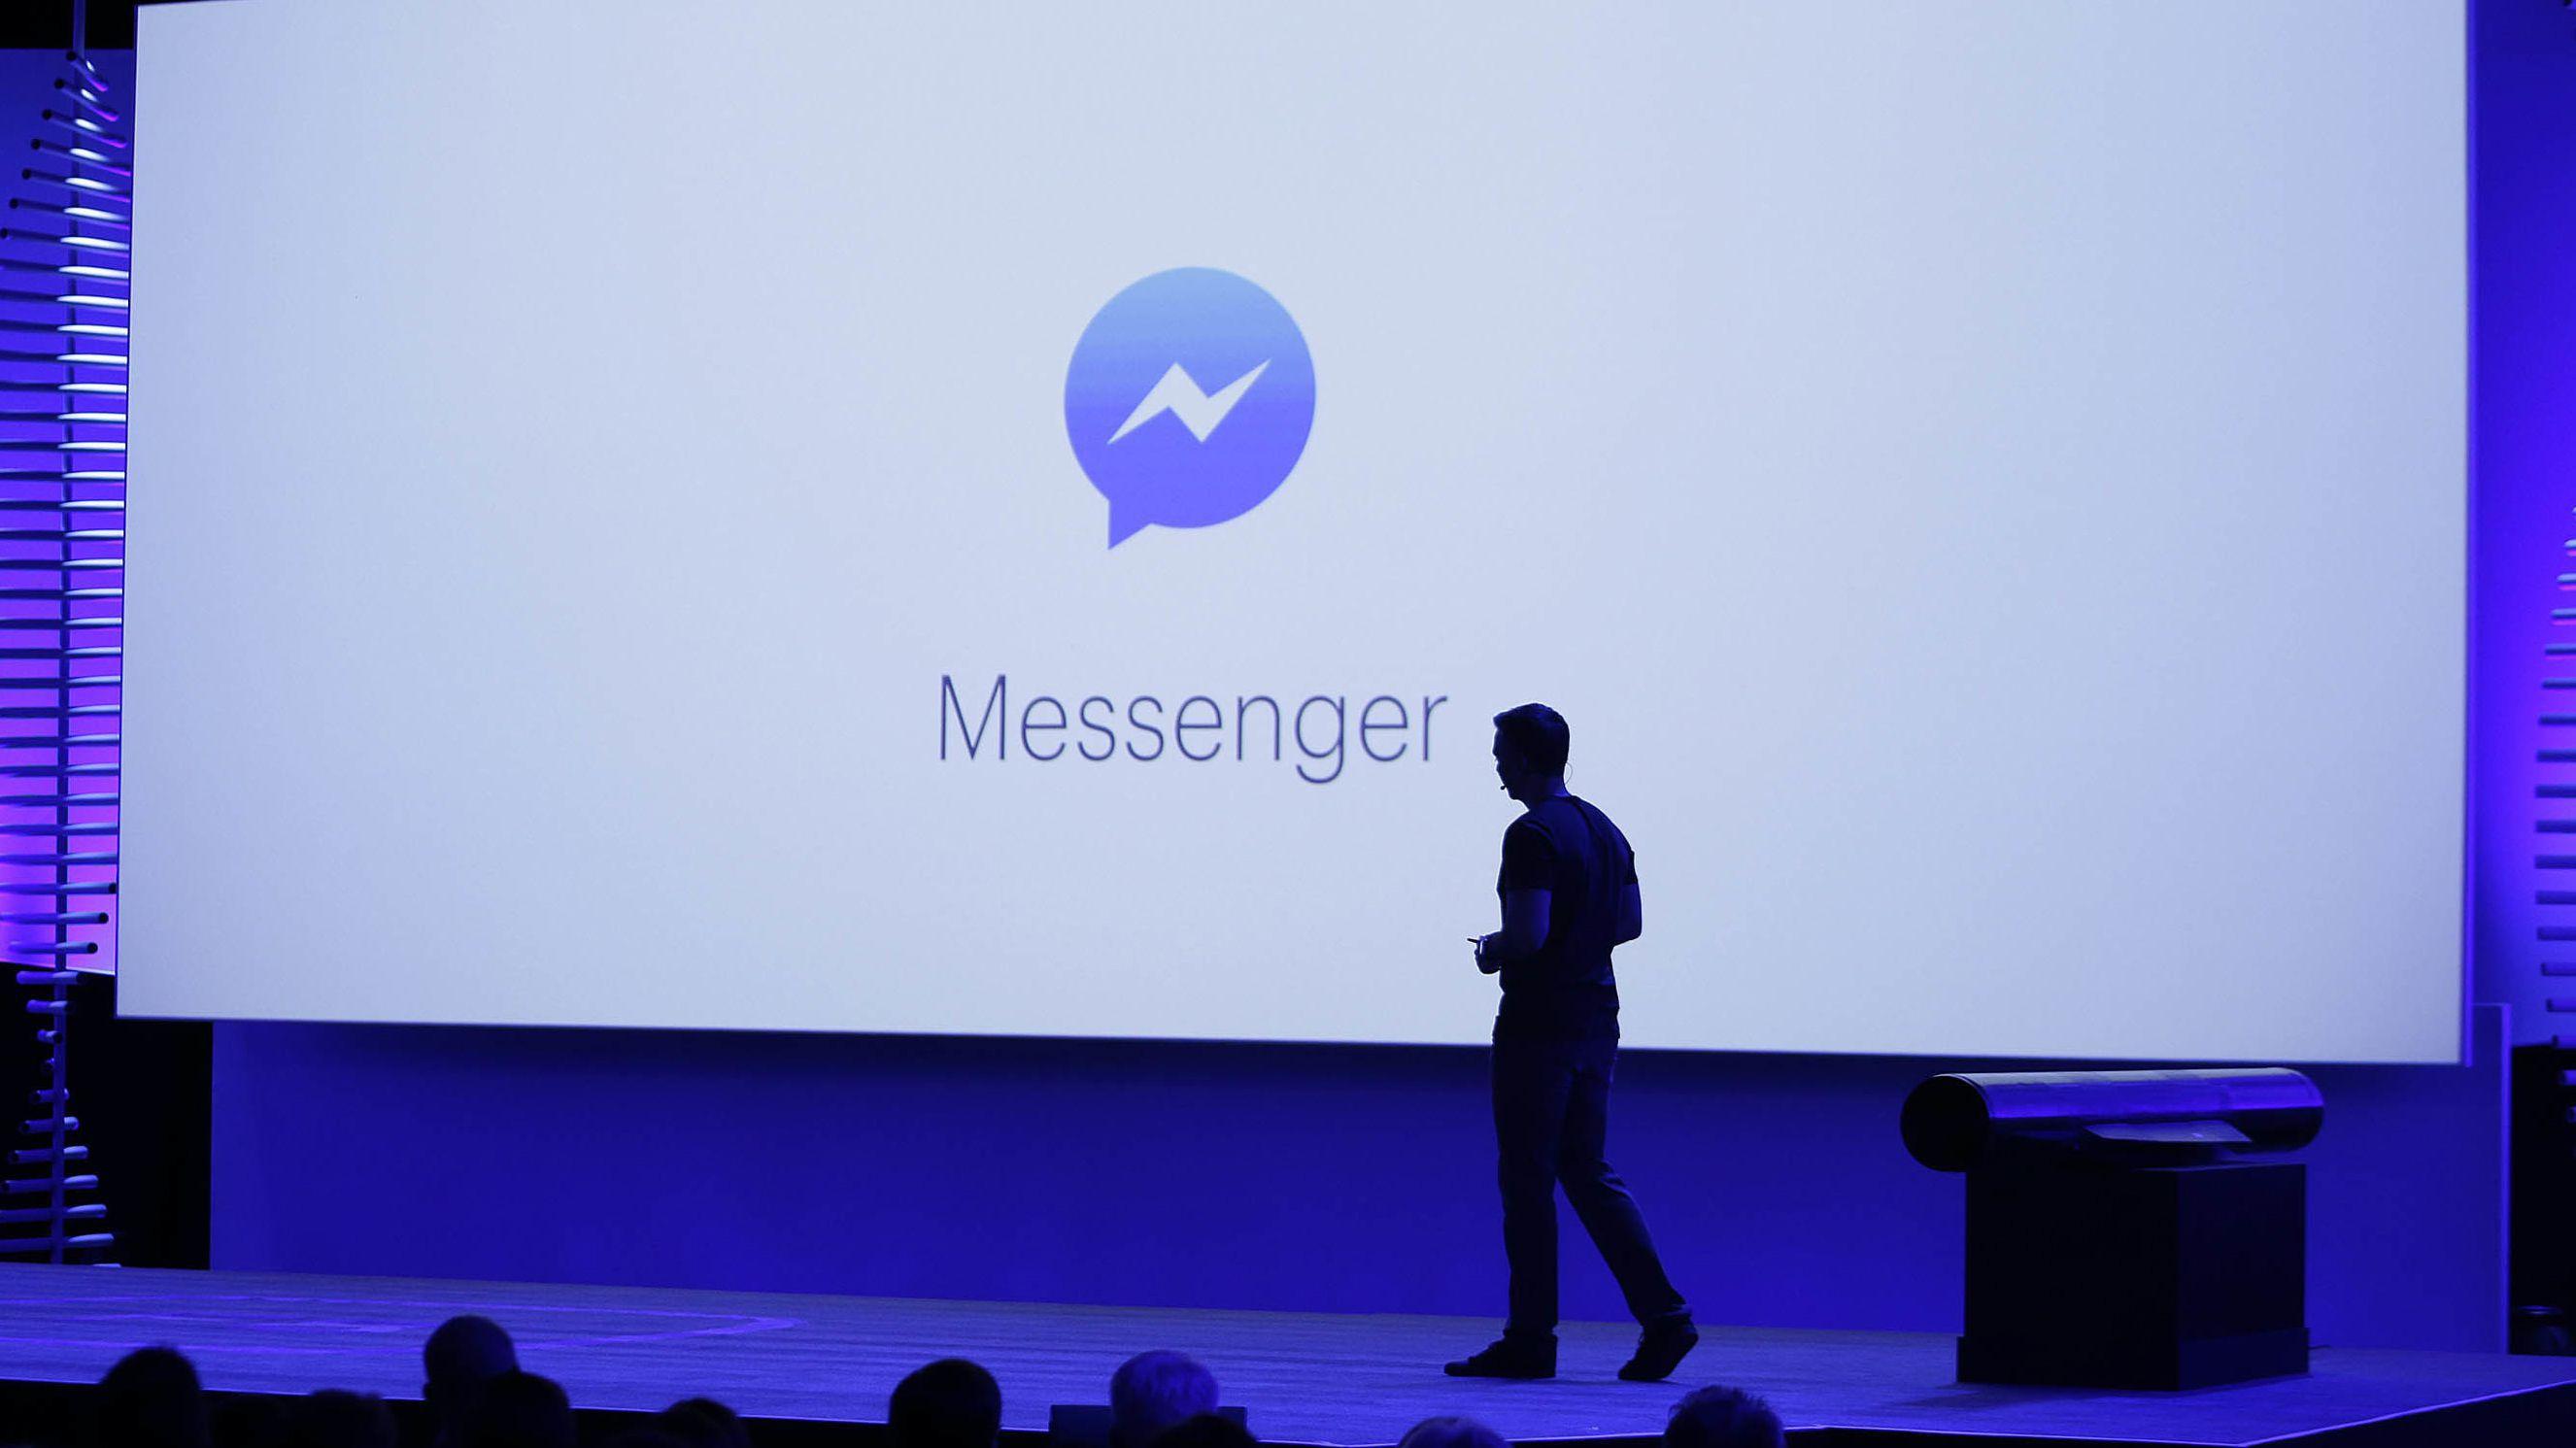 Facebook Hd Desktop